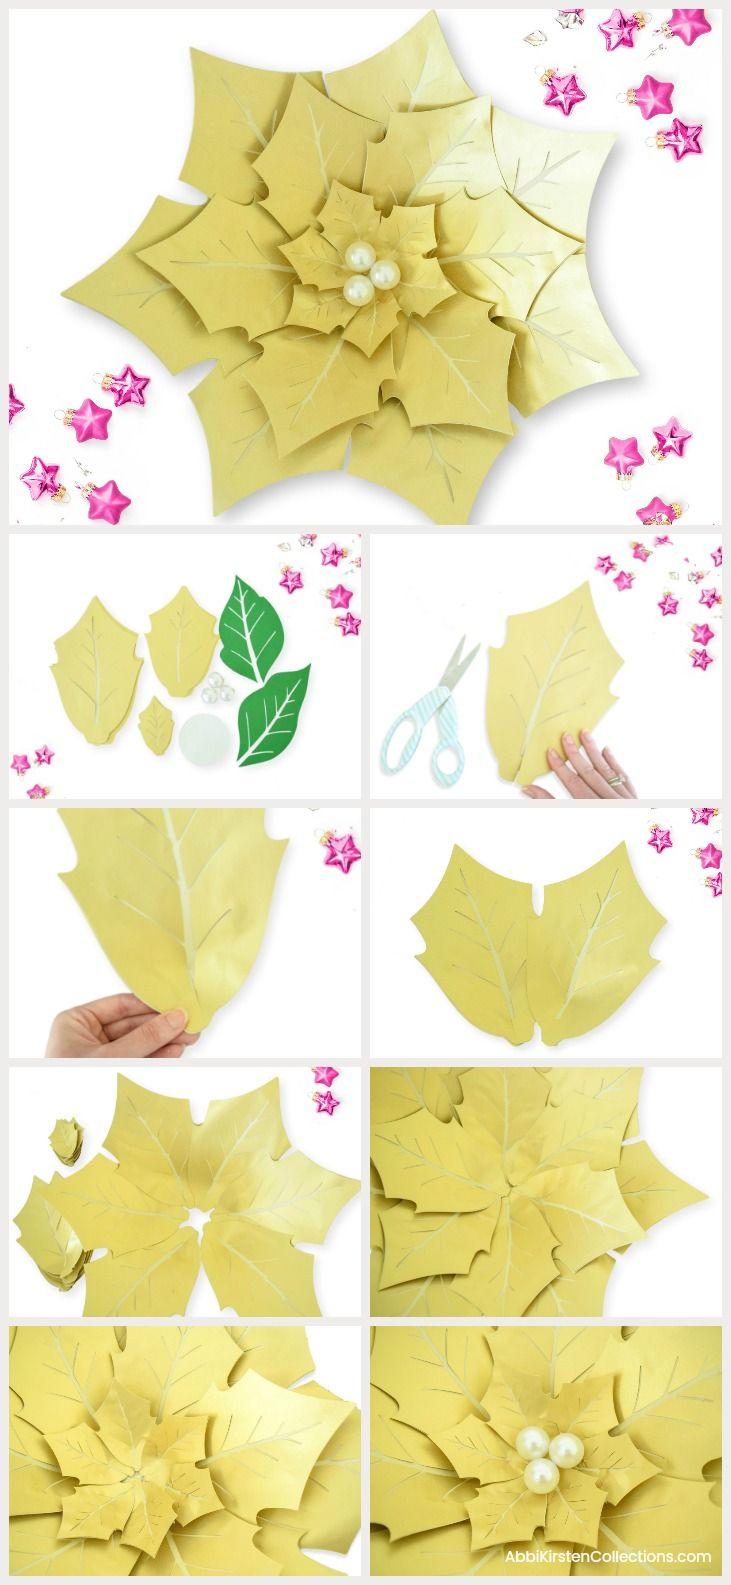 Merry Poinsettia Christmas Flower Template Paper Flower Patterns Flower Template Paper Flowers